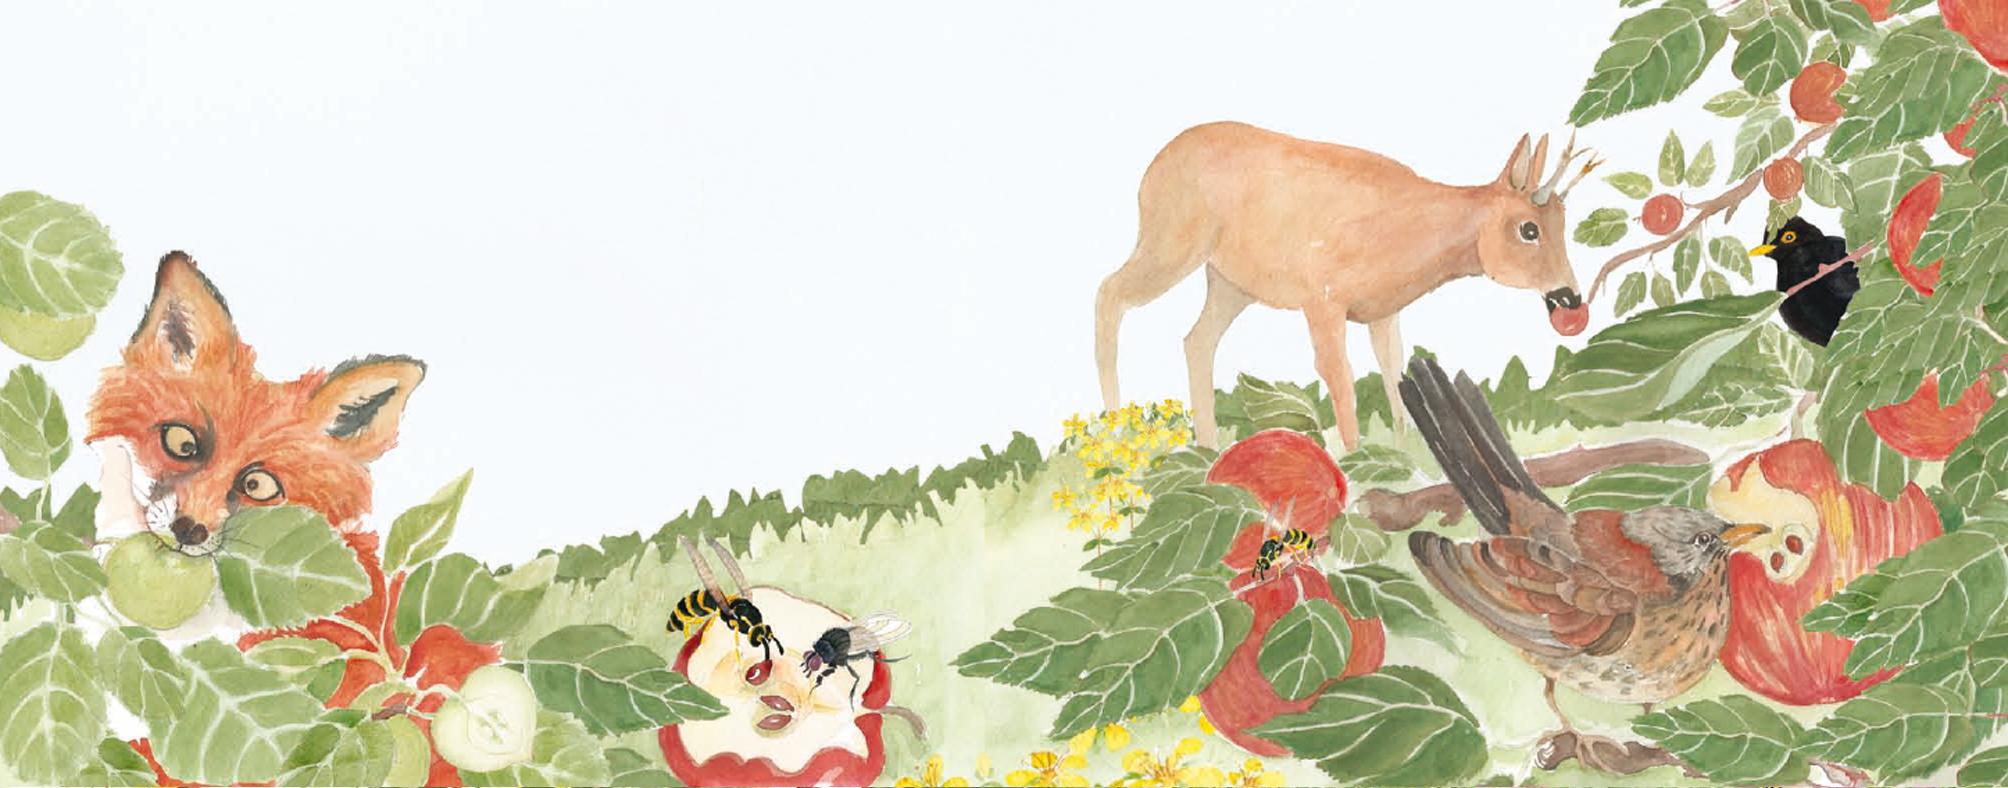 Bild aus dem Buch Lebendige Samen